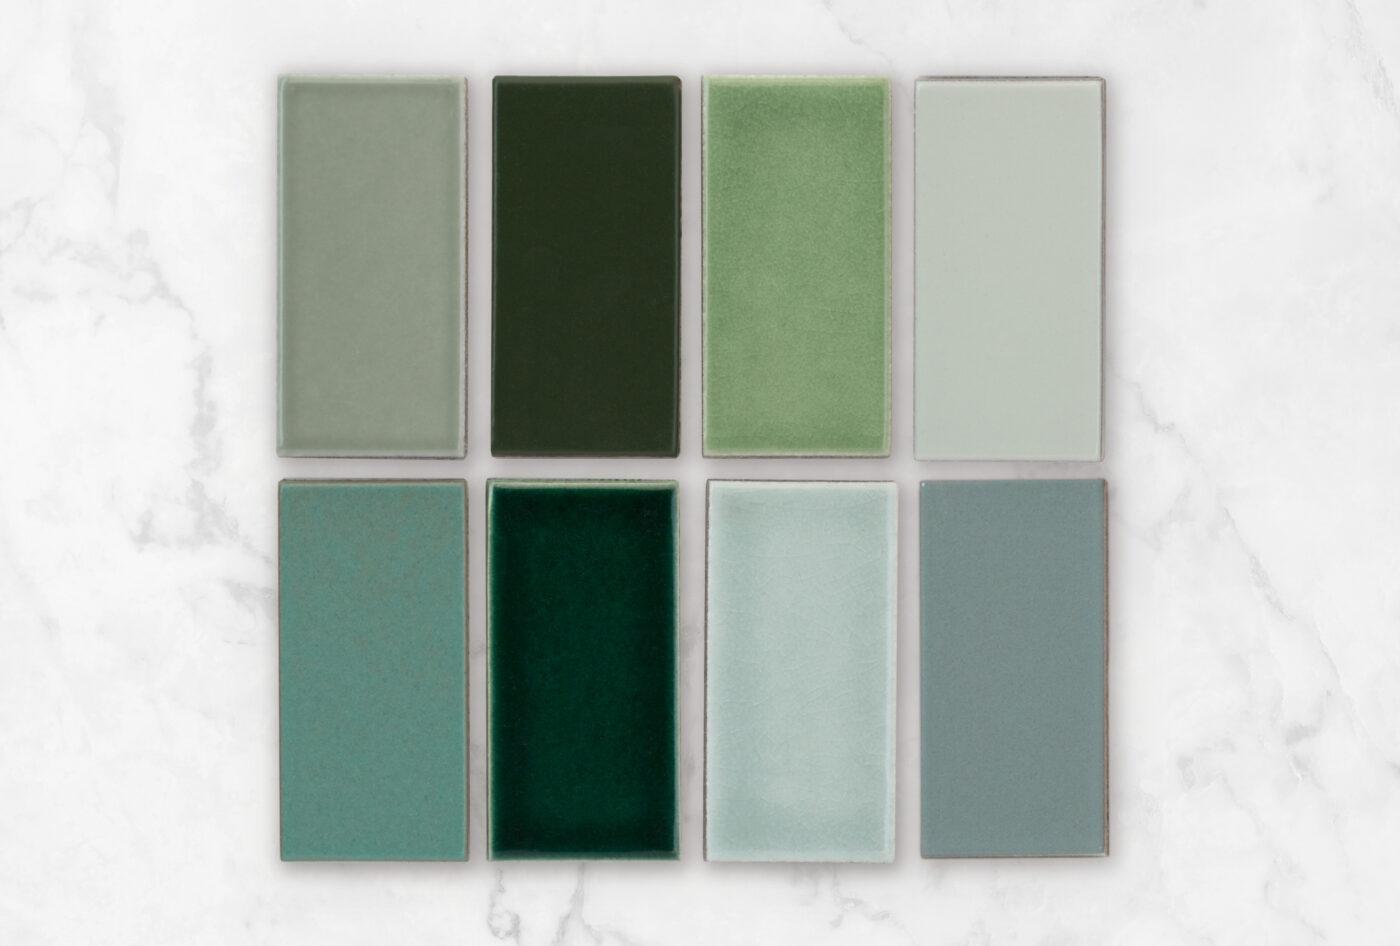 2020 Q1 Photo Fireclay Favorites Greens All Color Samples Rosemary Hunter Green Kelp Oyster Shell Tidewater Venetian Green Salton Sea Flagstone